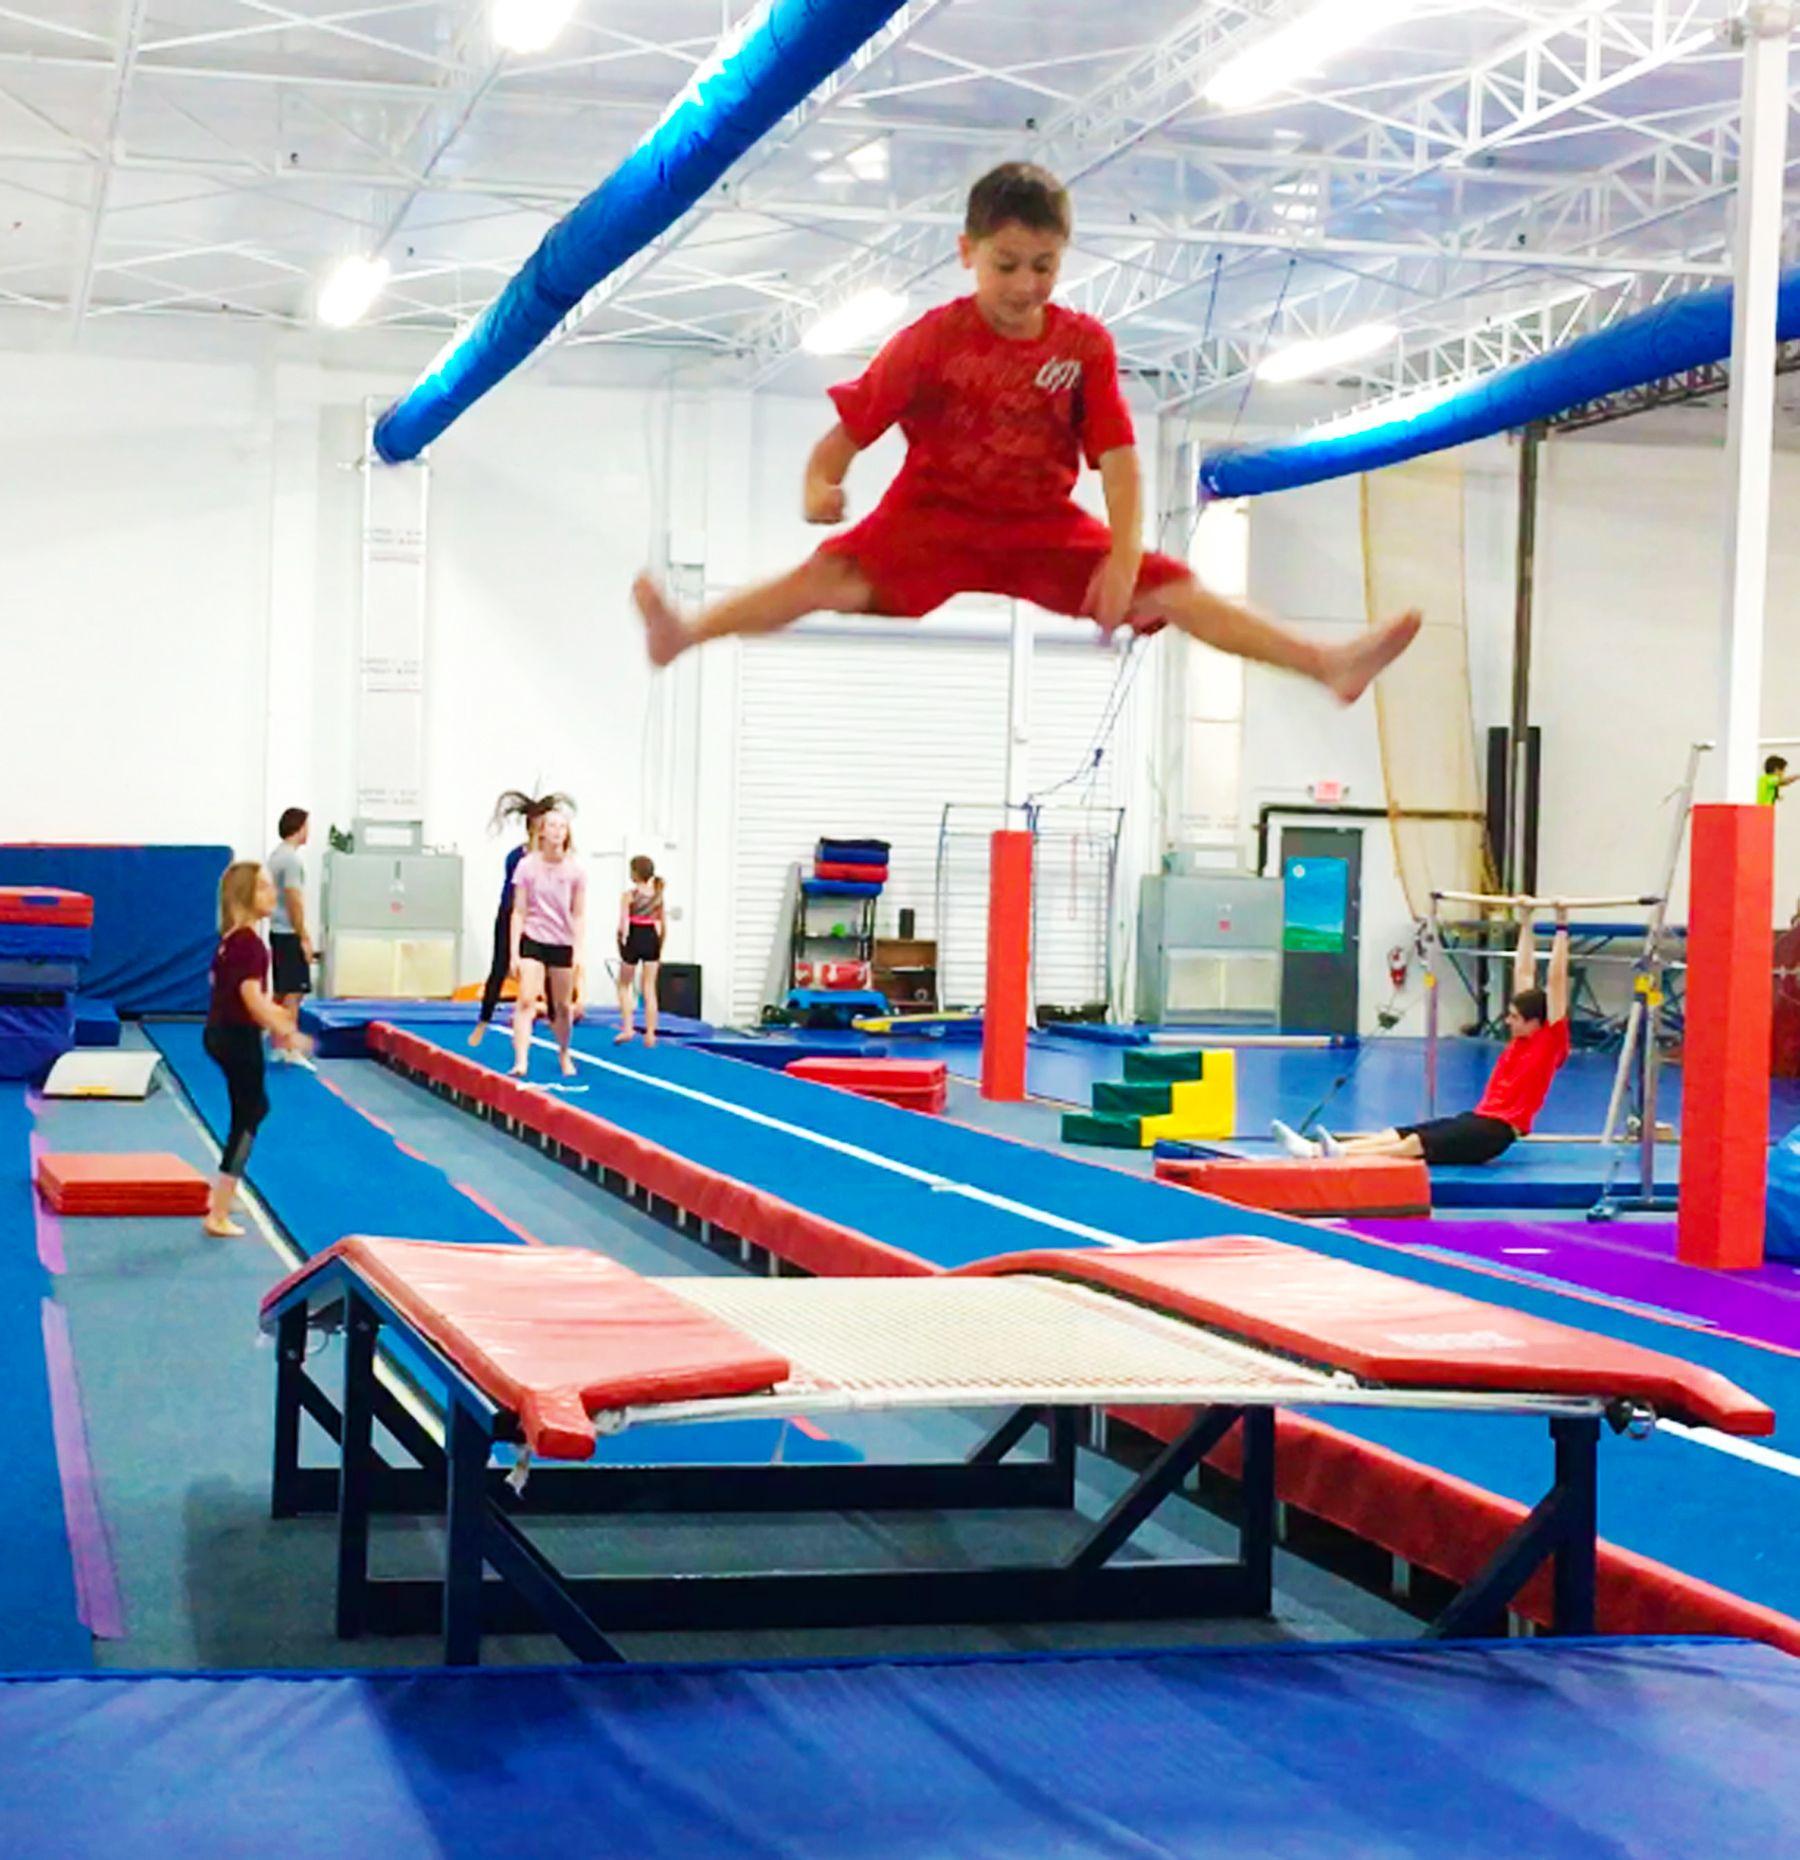 Trampoline & Tumbling: Double Mini Straddle Jump | Trampoline, Gymnastics, Tumbling